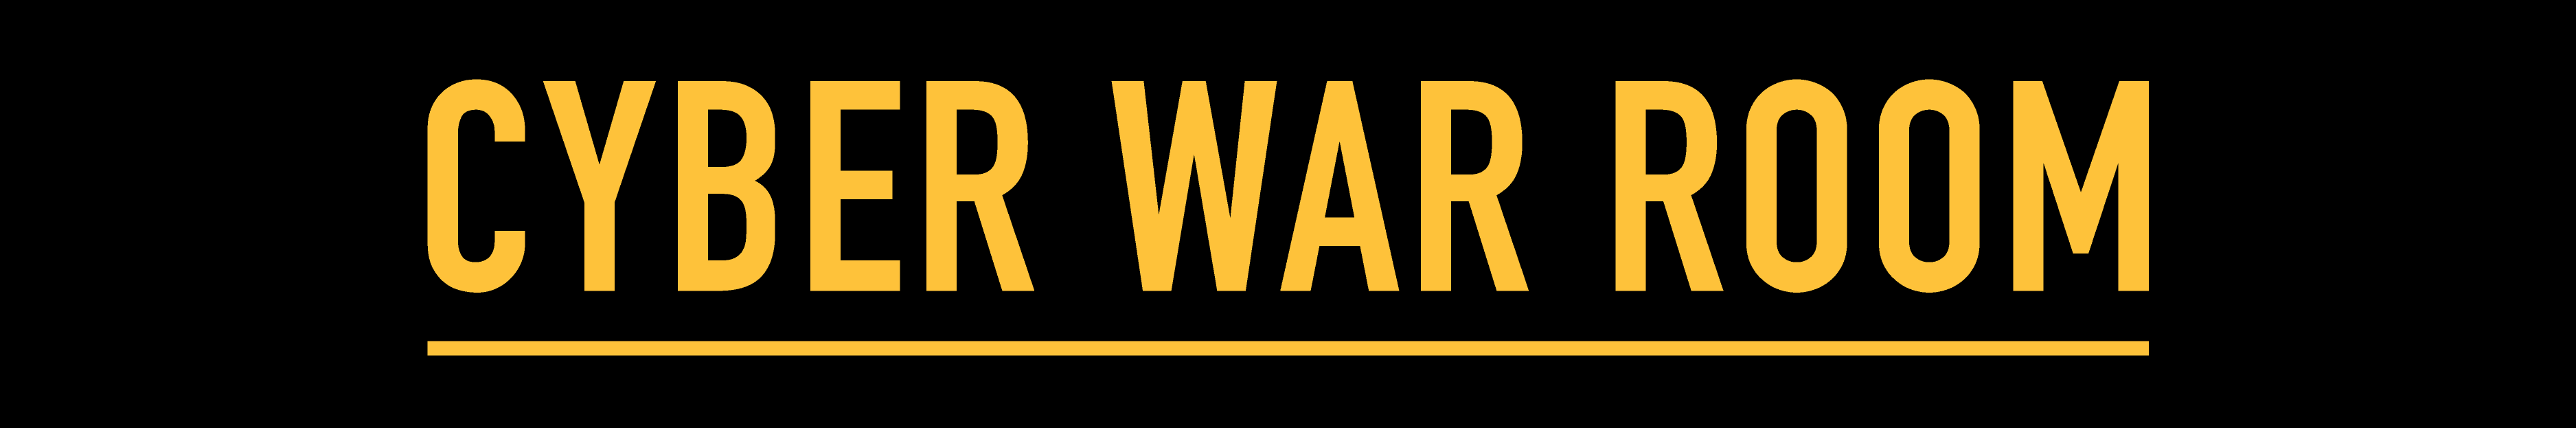 Cyber War Room